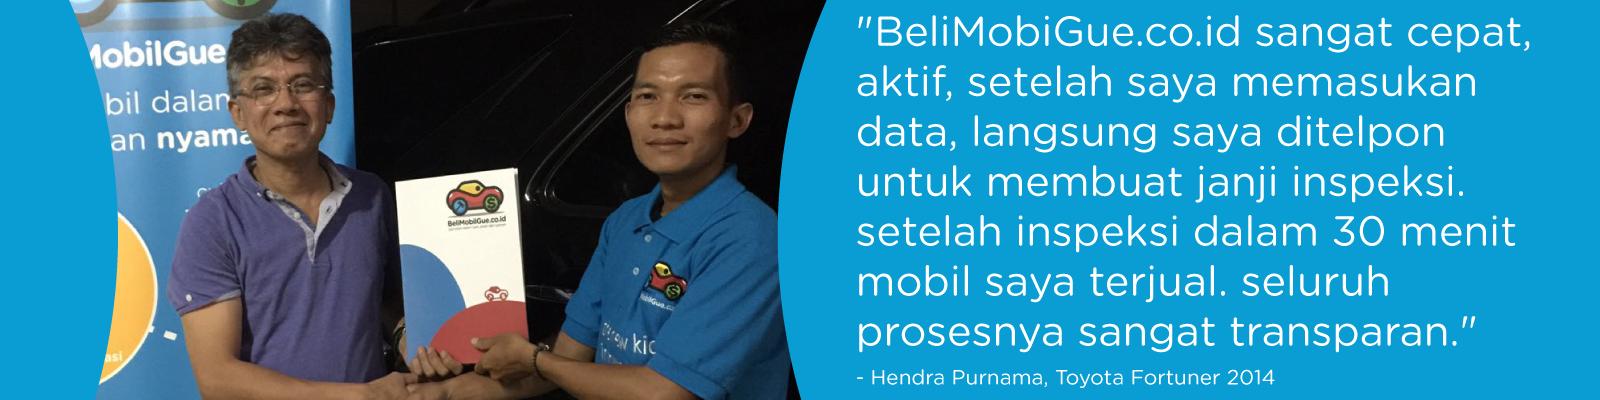 Testimonial BeliMobilGue.co.id